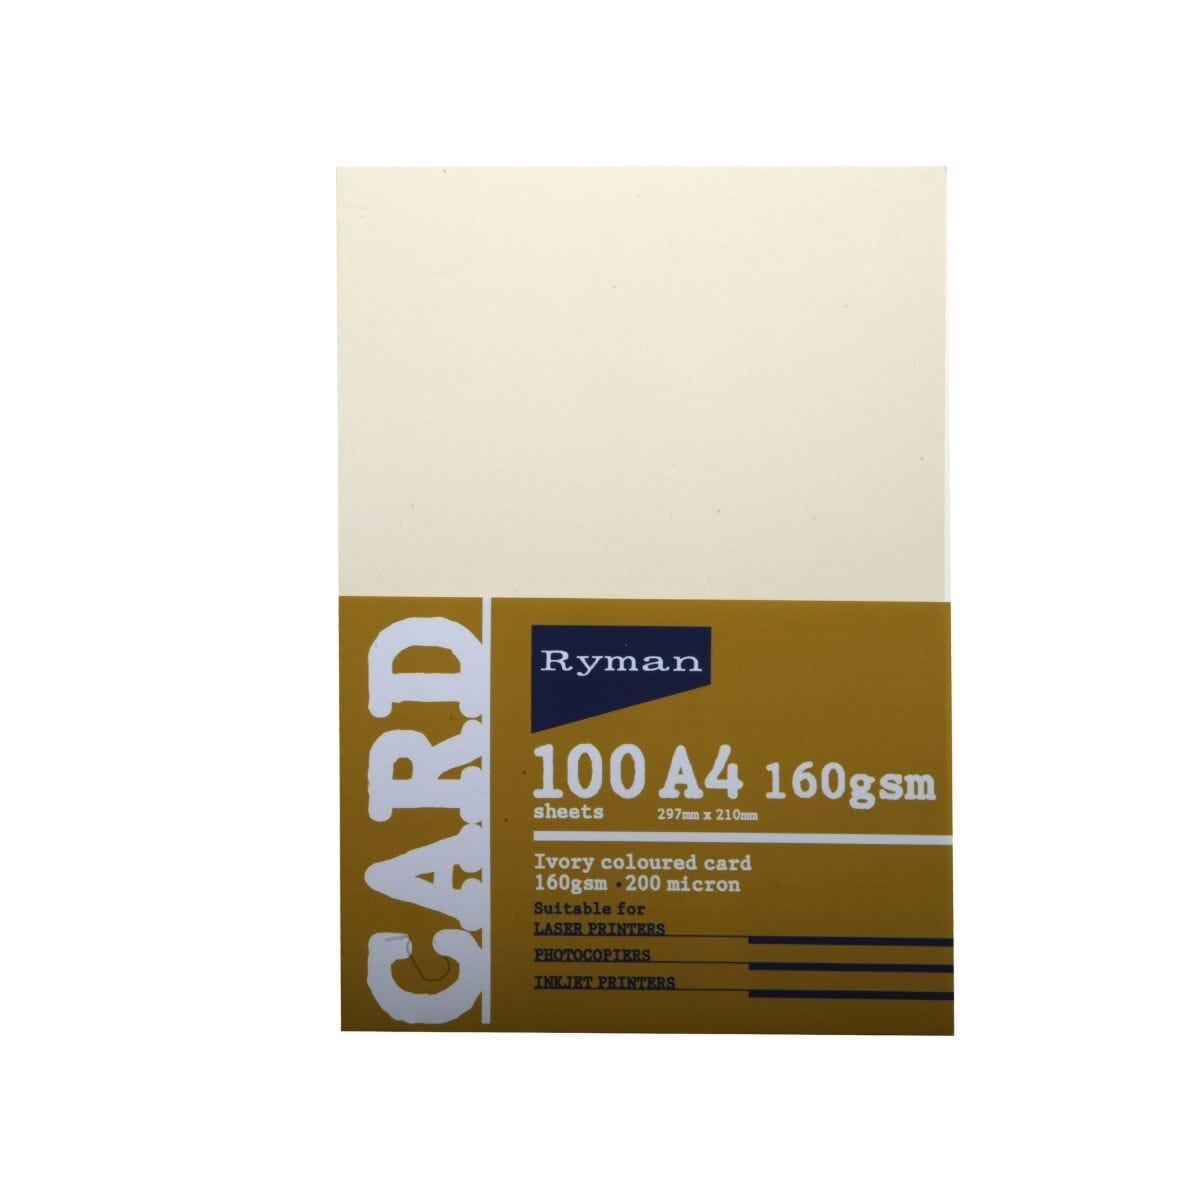 Ryman Card A4 160gsm 100 Sheets Ivory